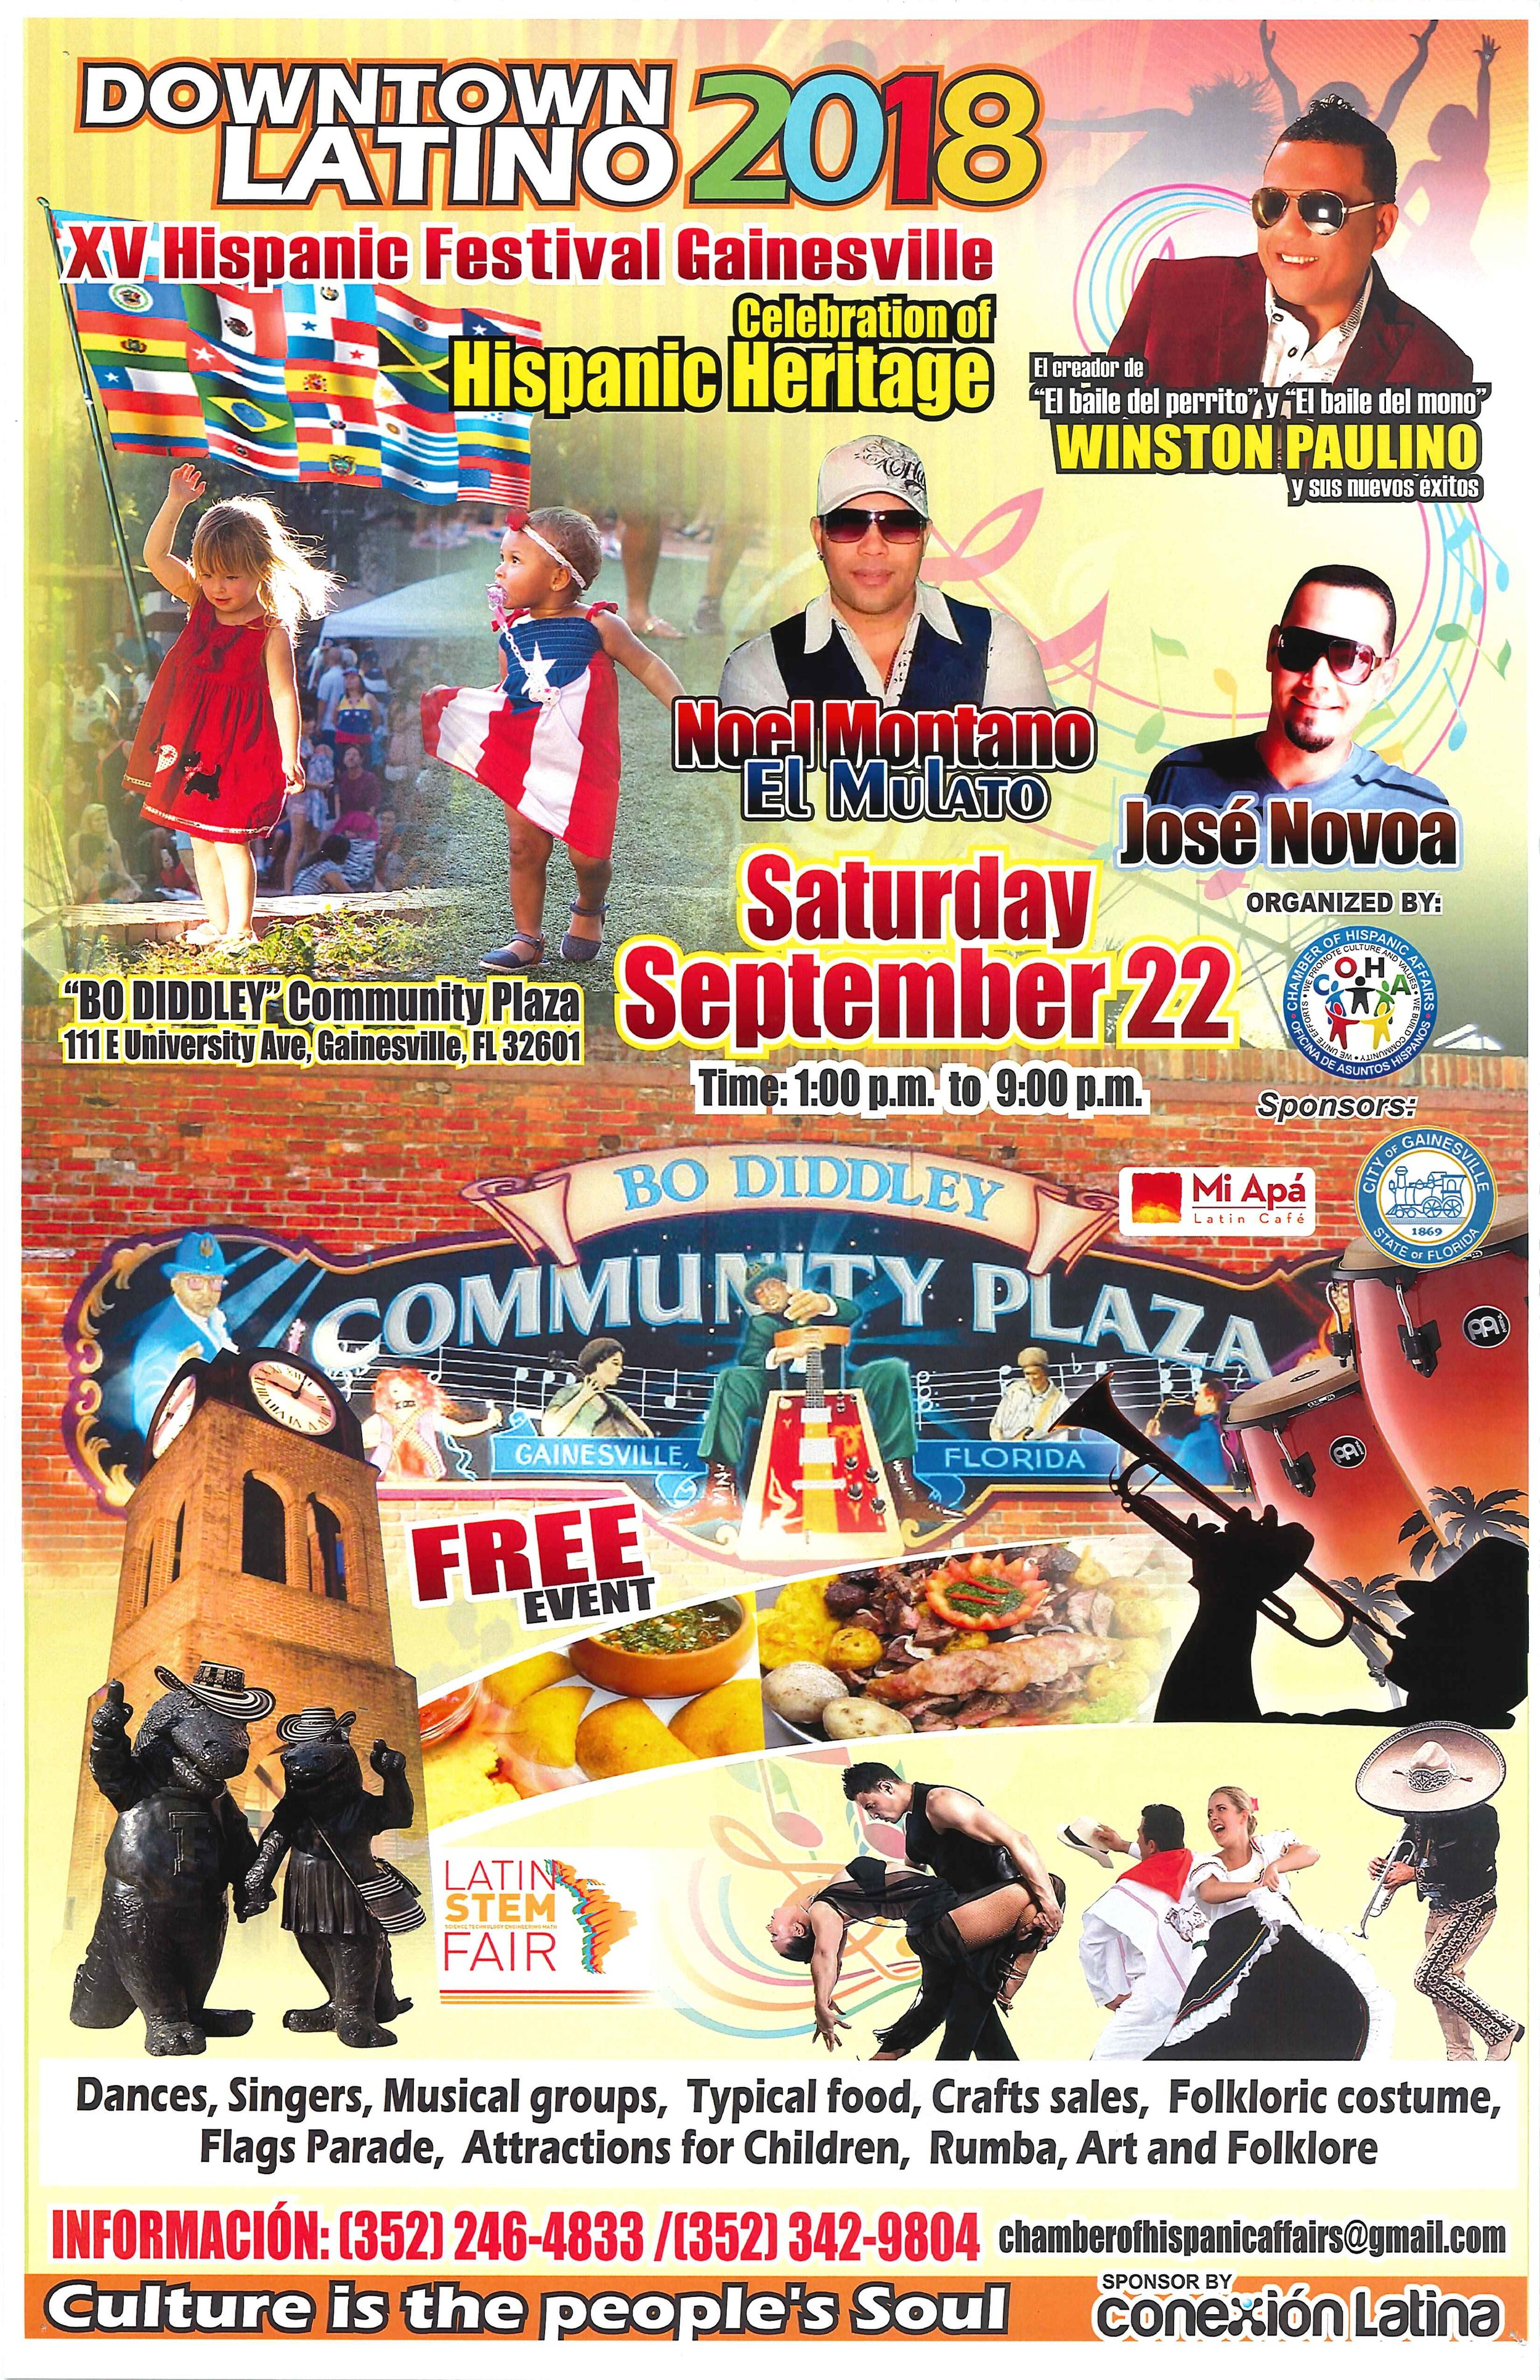 Downtown Latino 2018 Poster.jpg